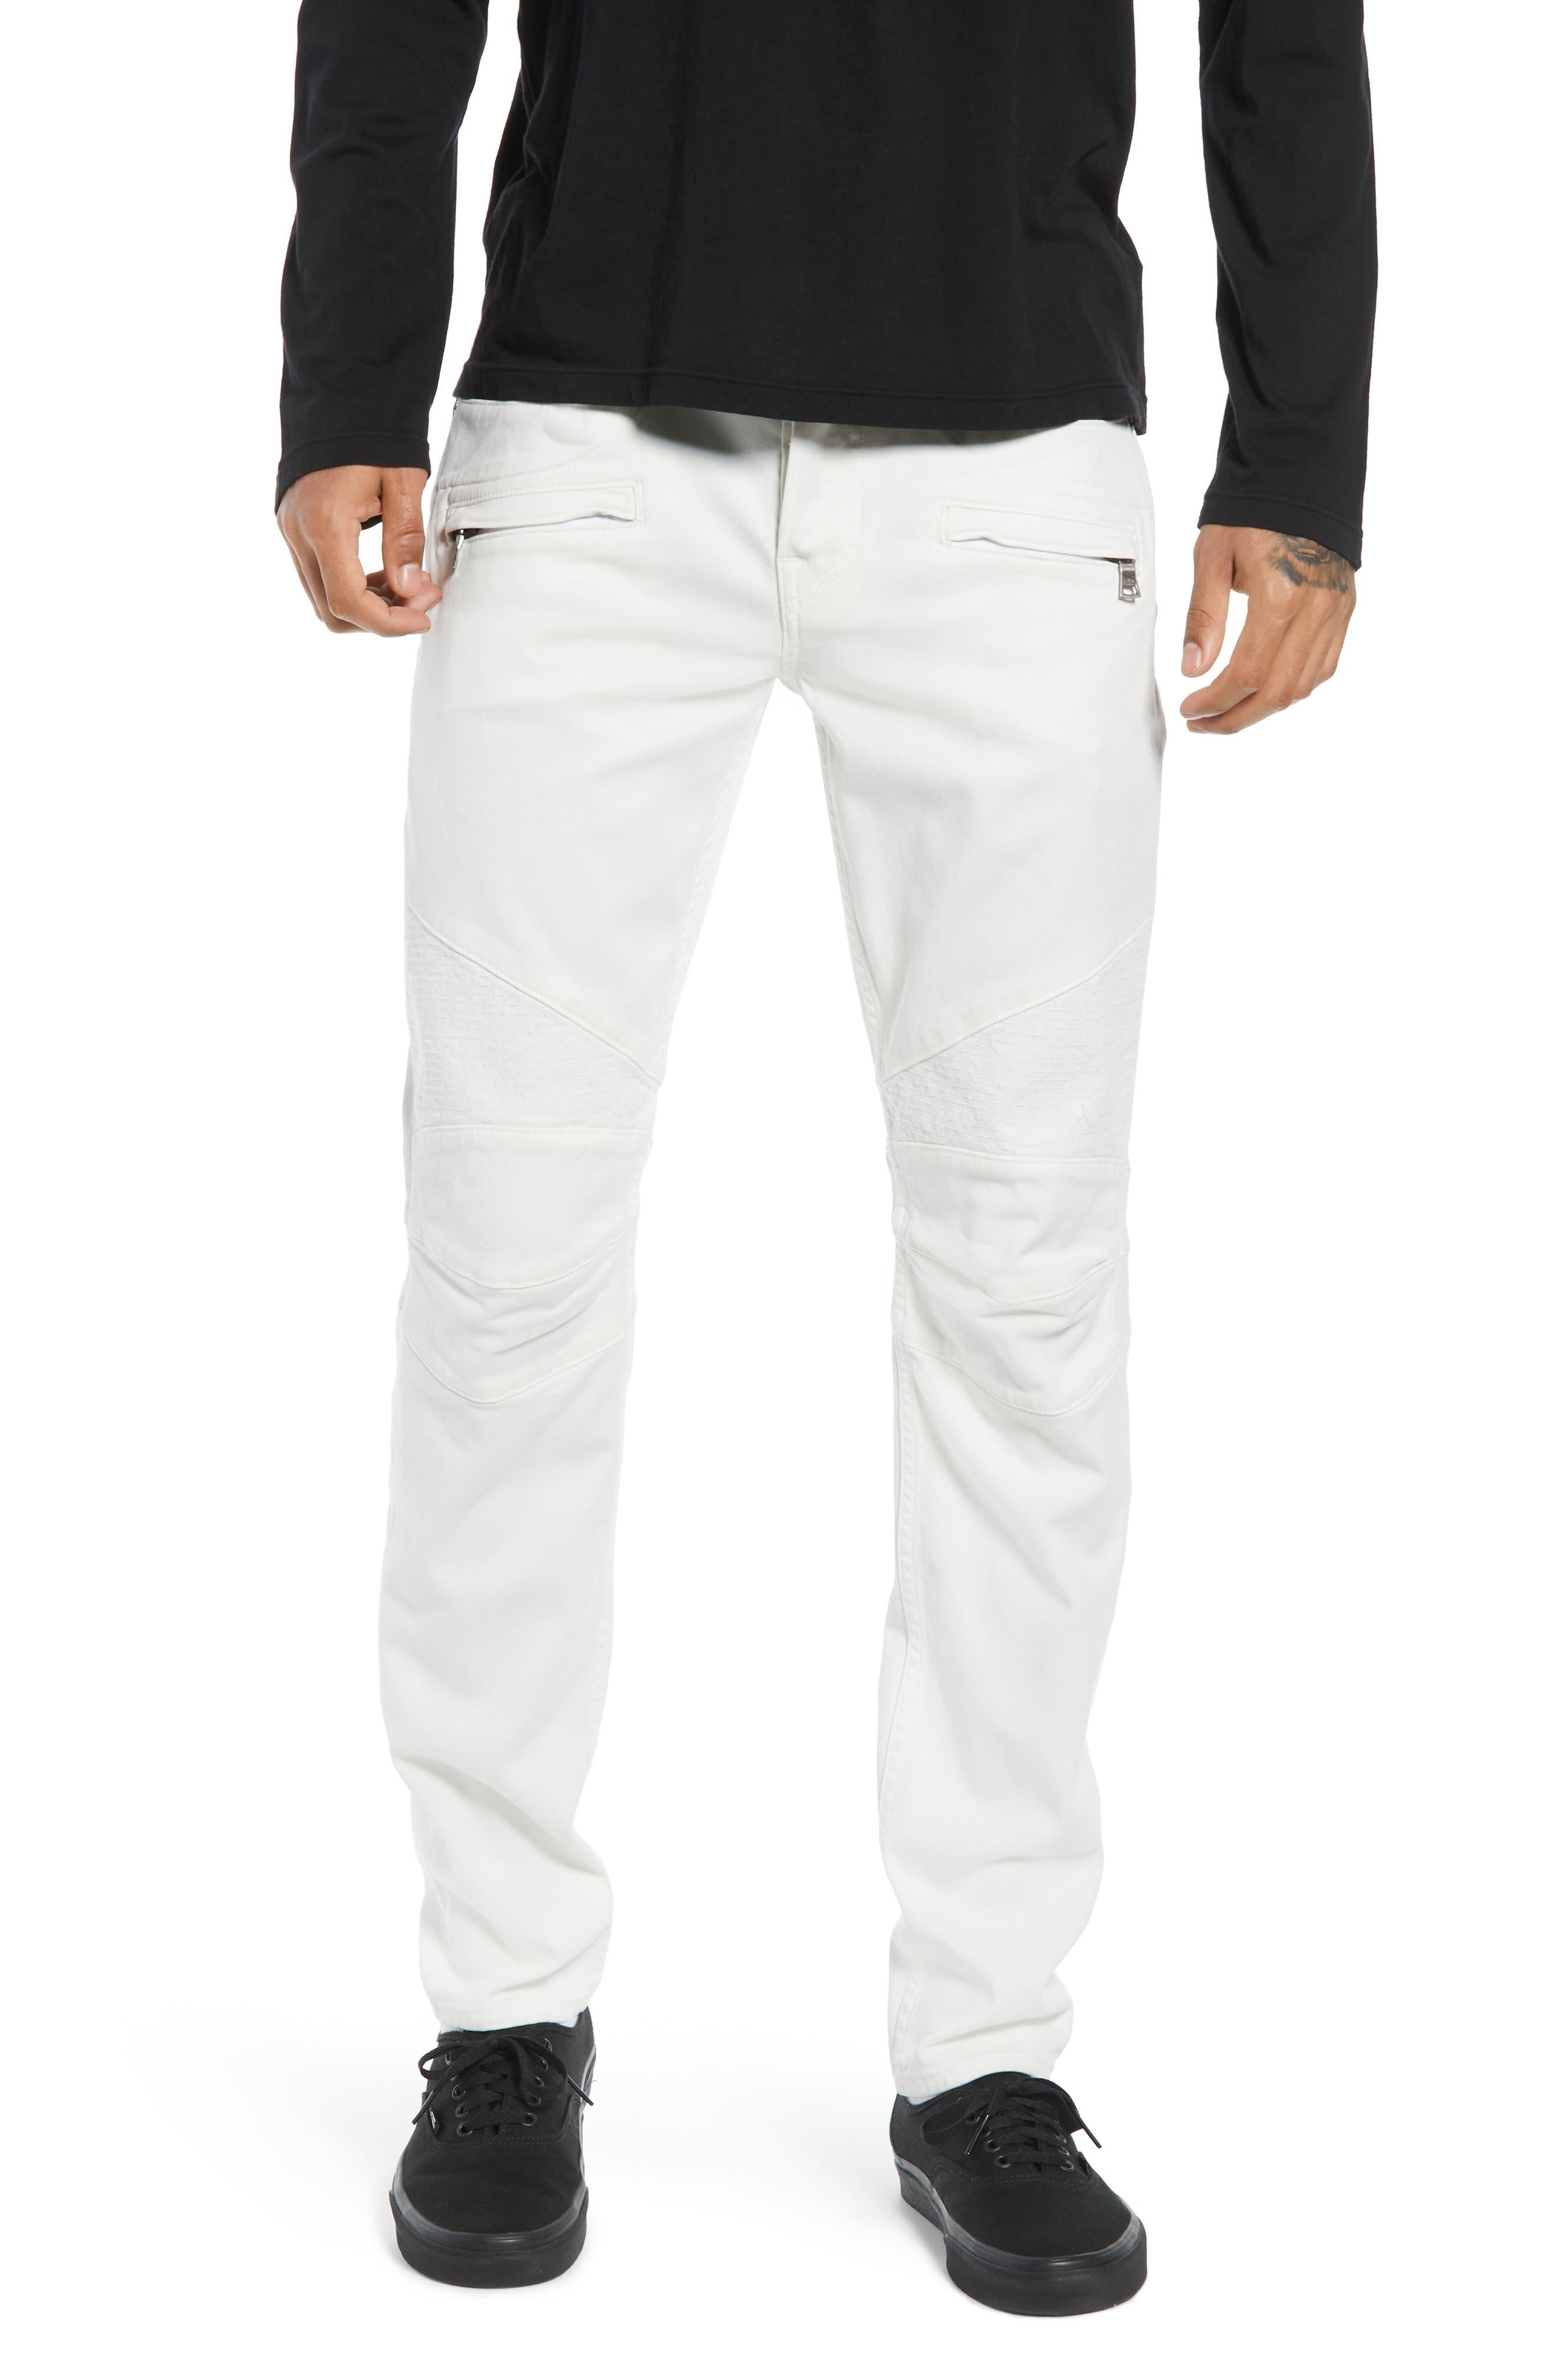 Blinder Biker Skinny Fit Jeans,                             Main thumbnail 1, color,                             DIRTY WHITE